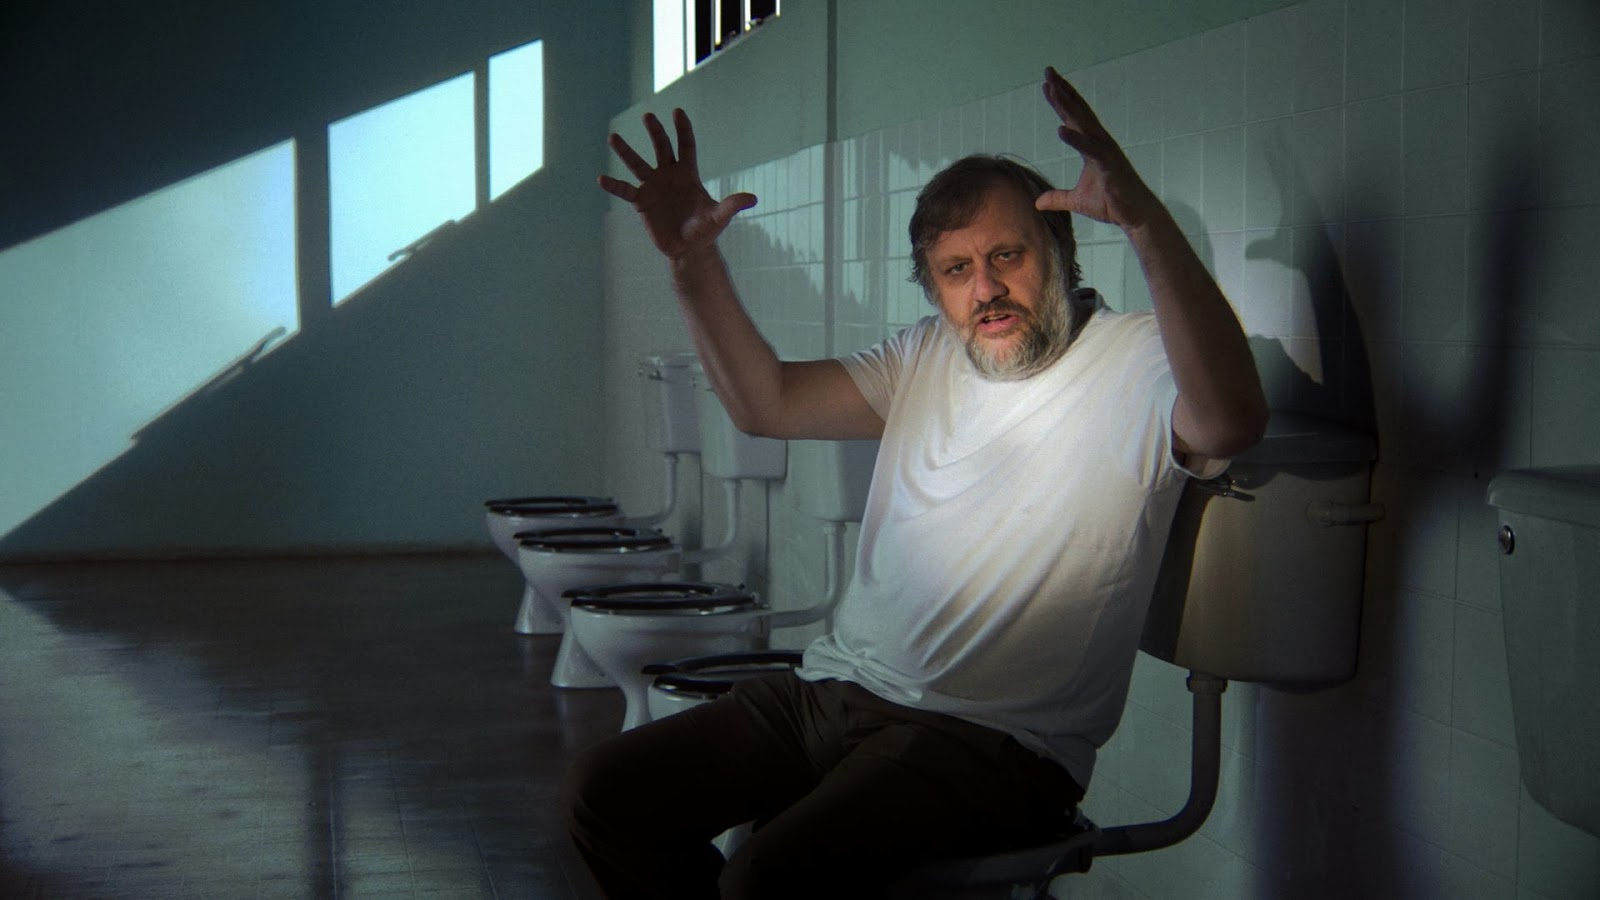 TrustMovies: Slavoj Zizek & Sophie Fiennes' THE PERVERT'S ...